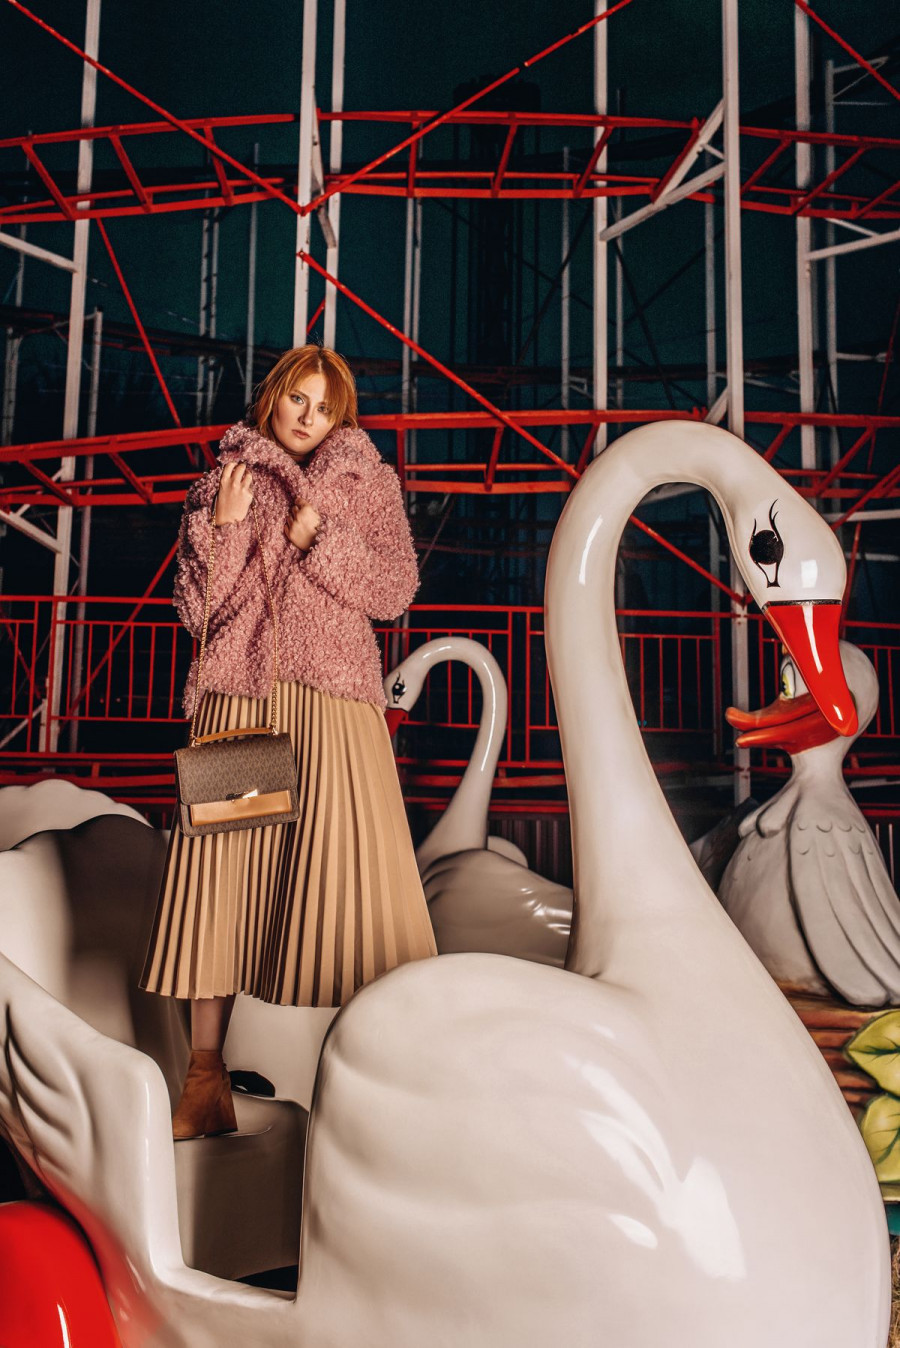 На Диане: шуба Cristina Effe, джемпер Cristina Effe, юбка Akhmadullina dreams, обувь Michael Kors, сумка Michael Kors, @ampersand.barnaul